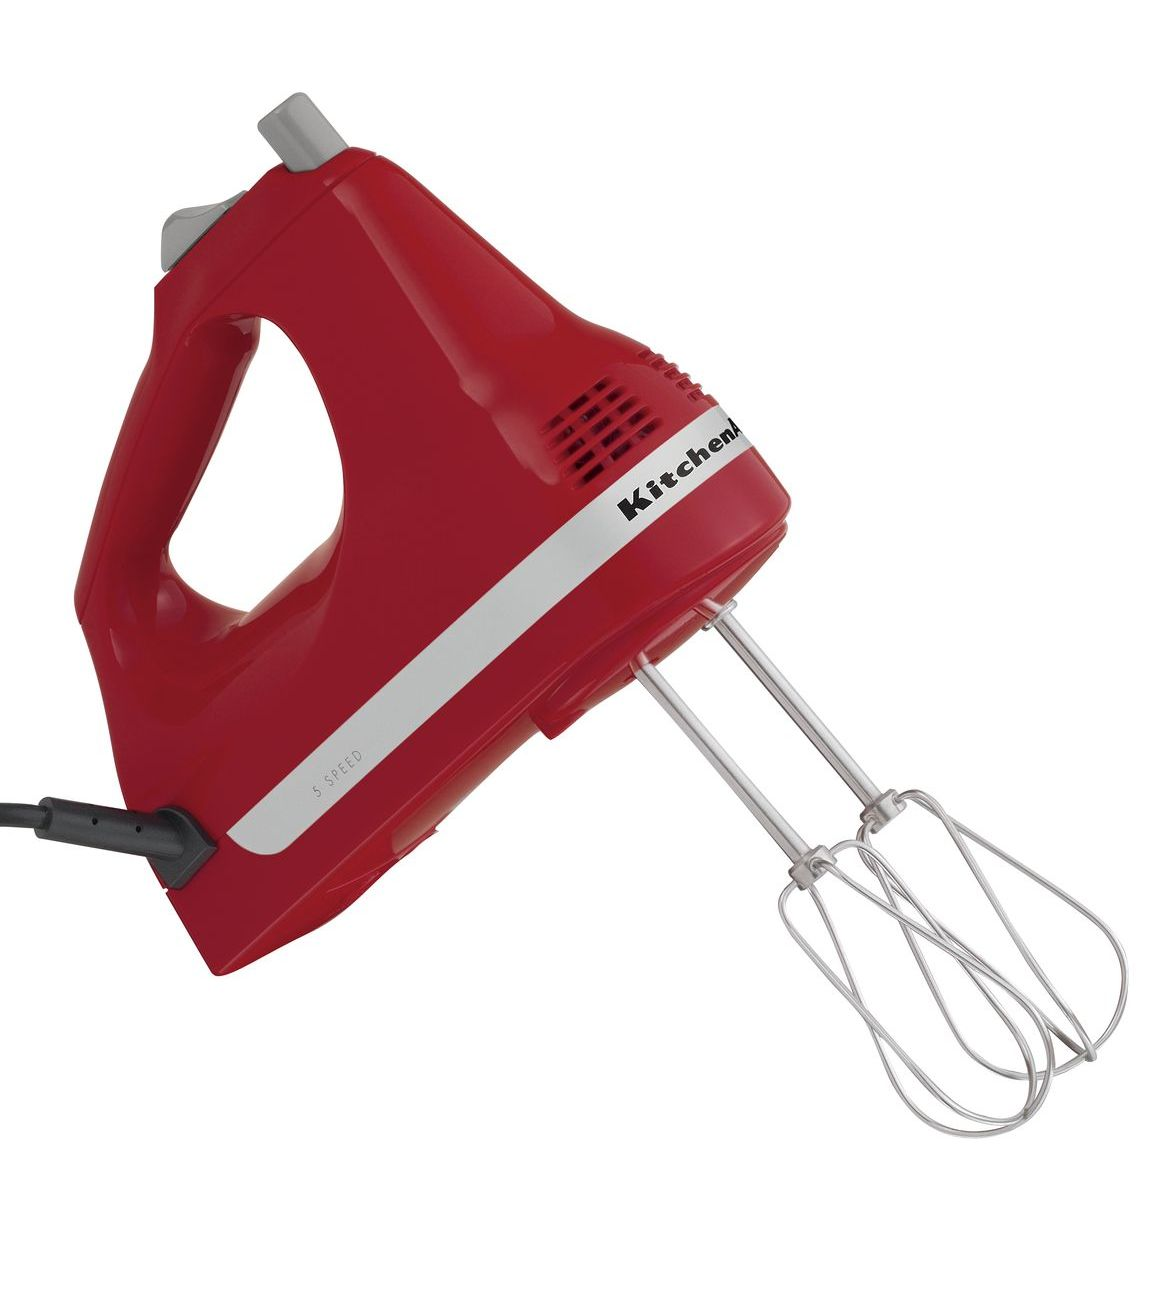 Red kitchenaid hand mixer photo - 1